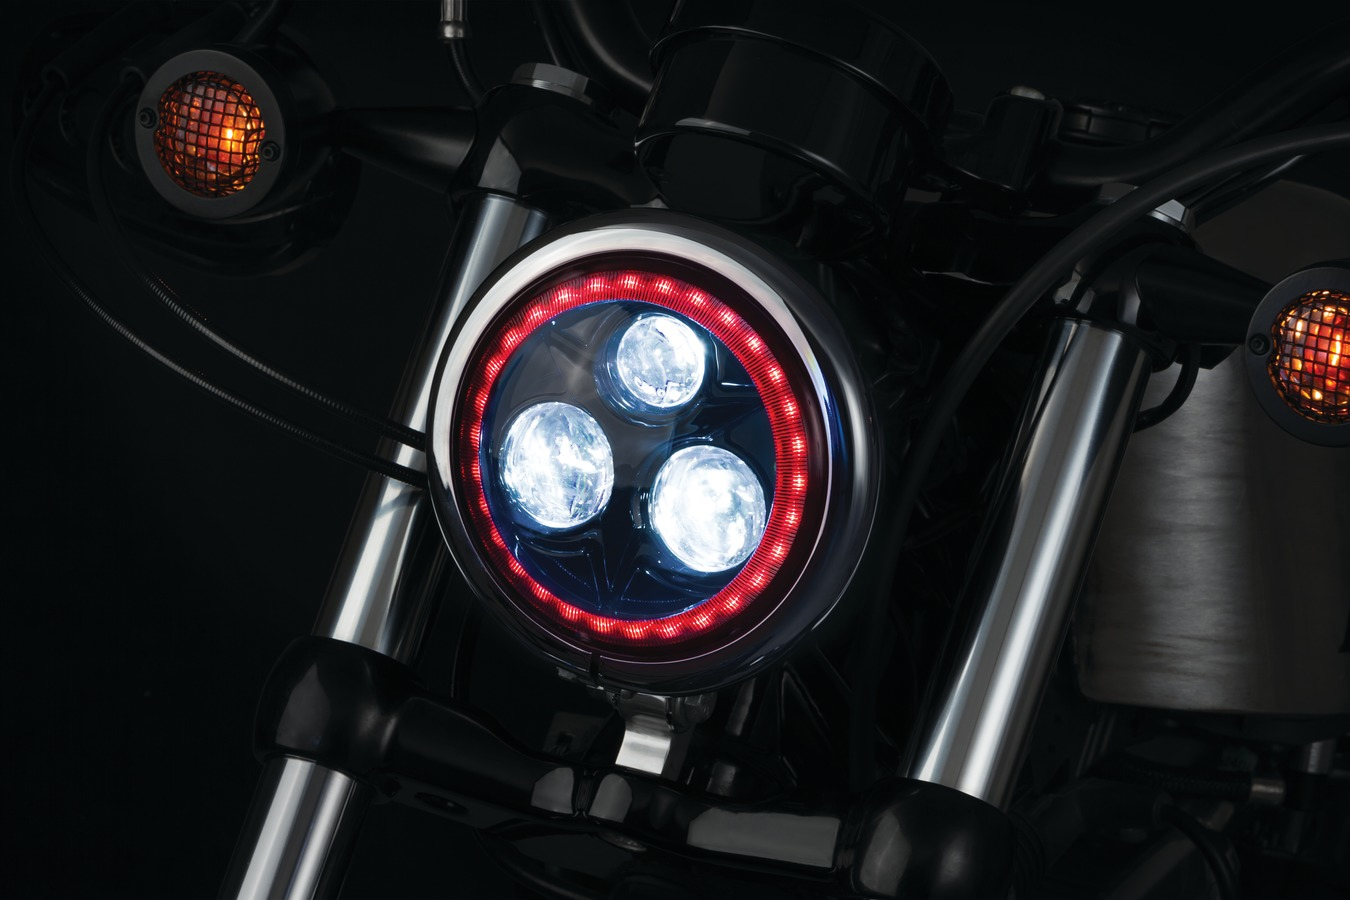 "Kuryakyn Orbit 5-3-4"" L.E.D. Headlights"